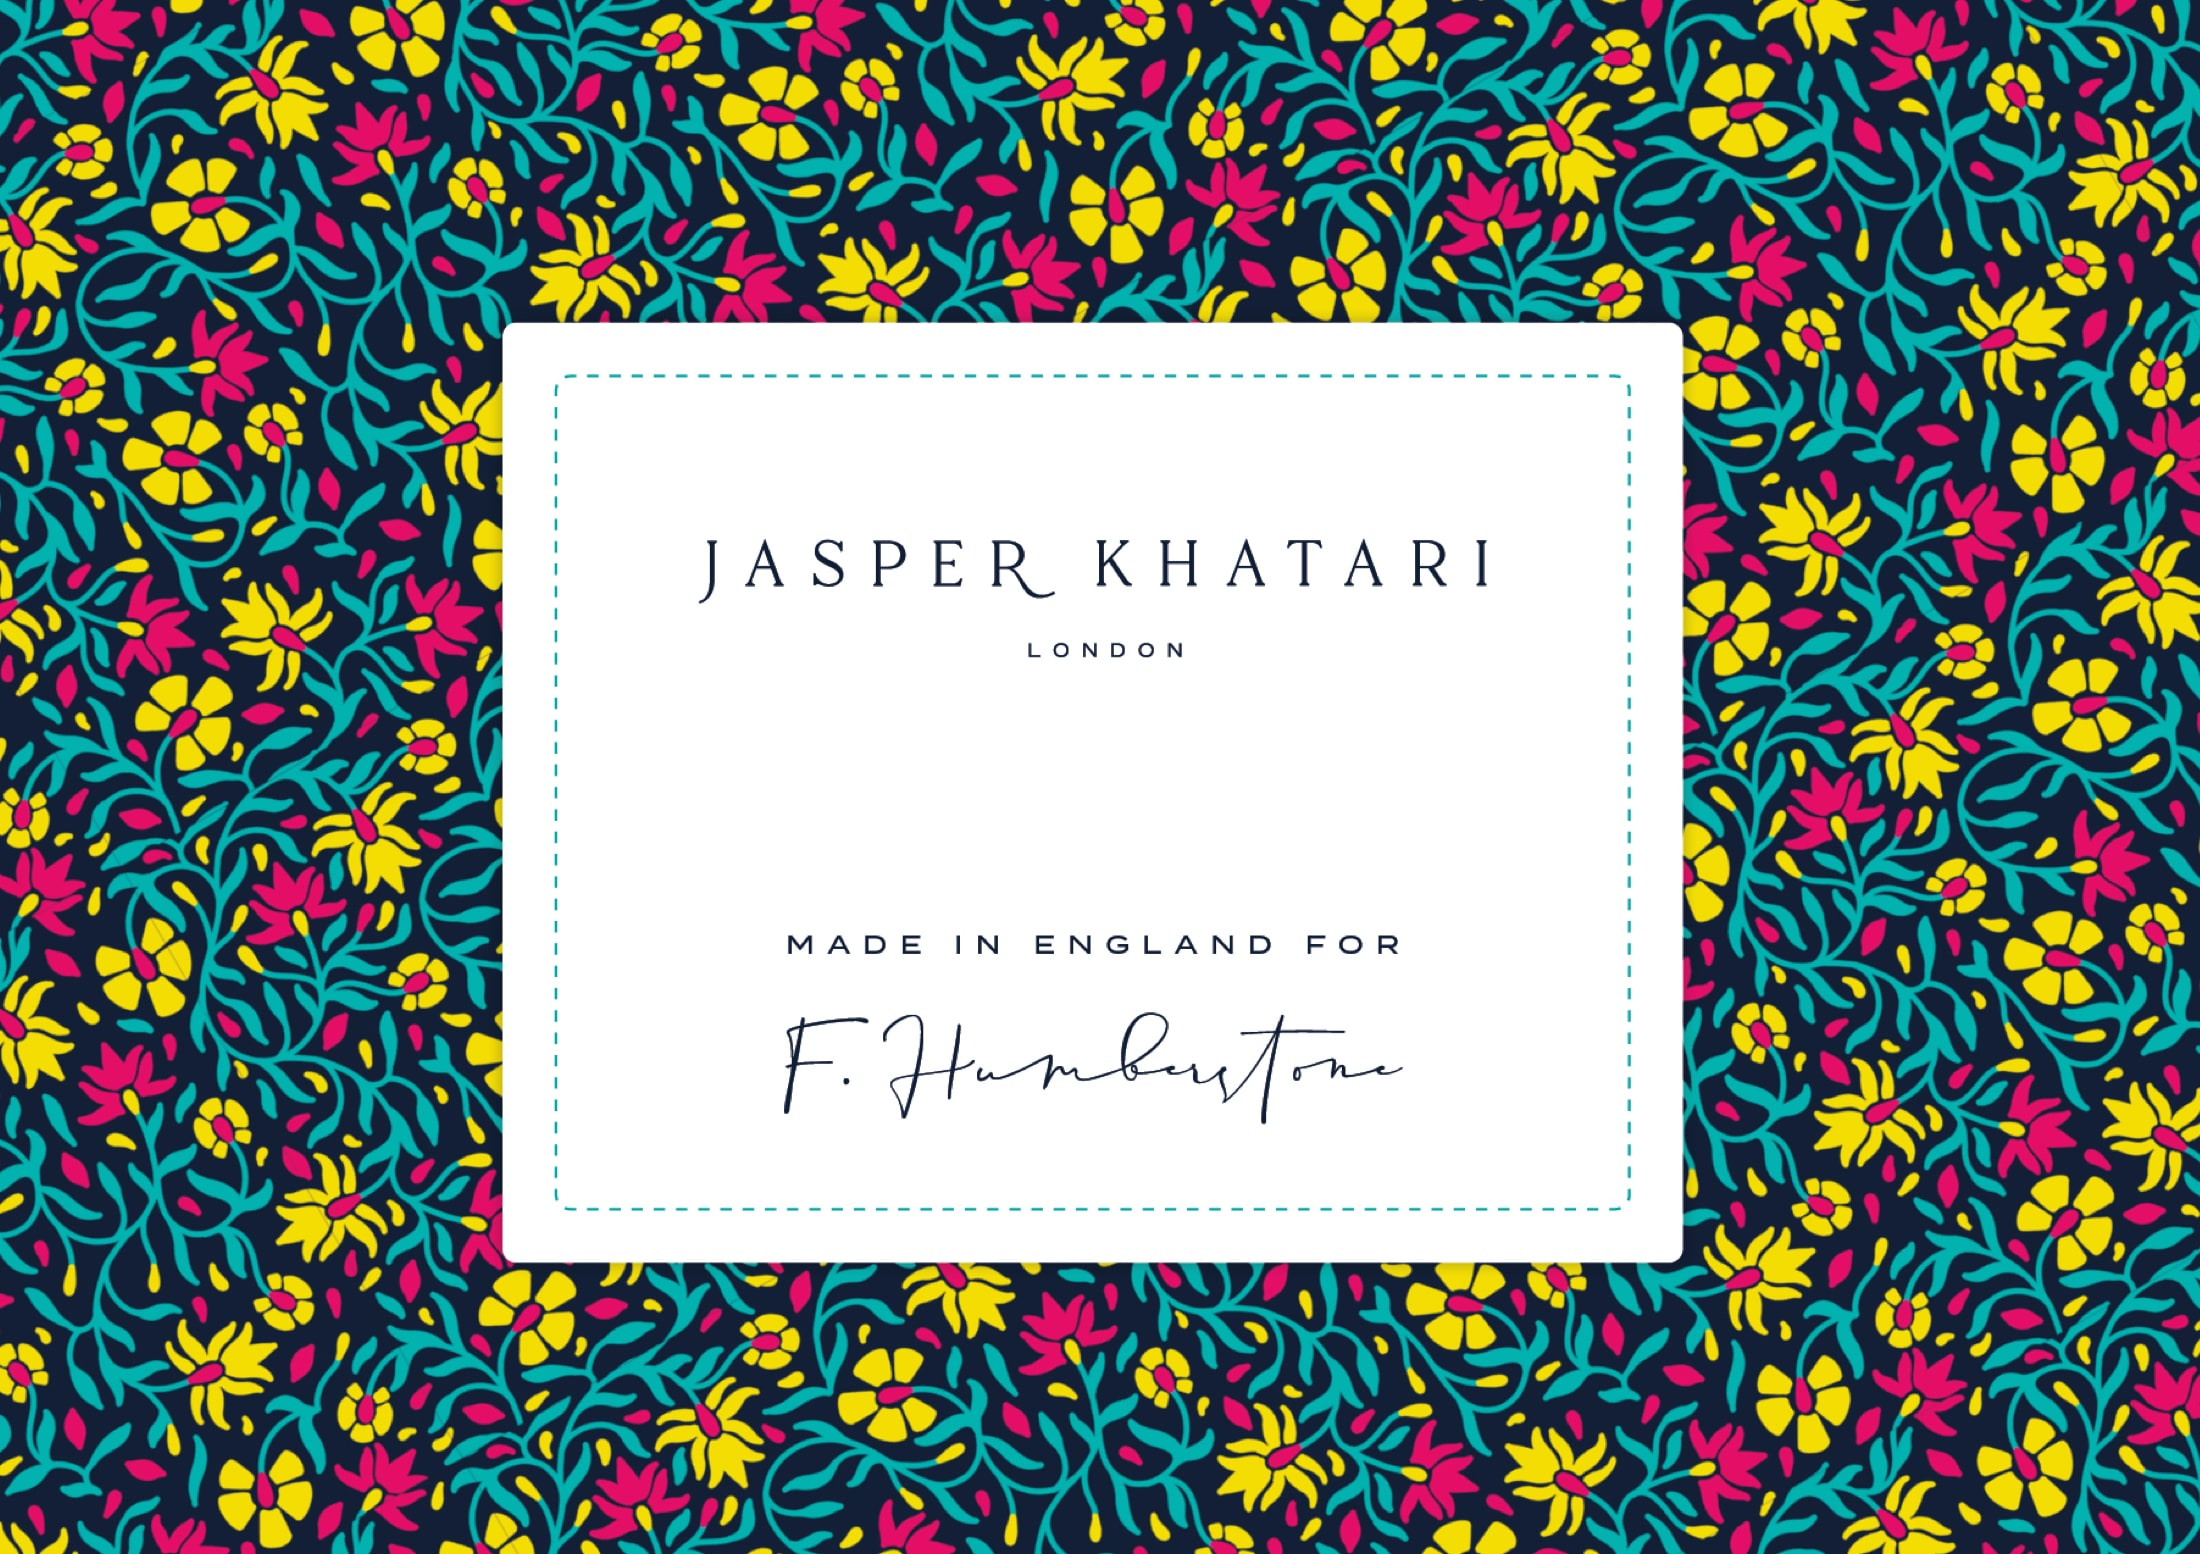 Woven label and pattern design for Savile Row tailor, Jasper Khatari